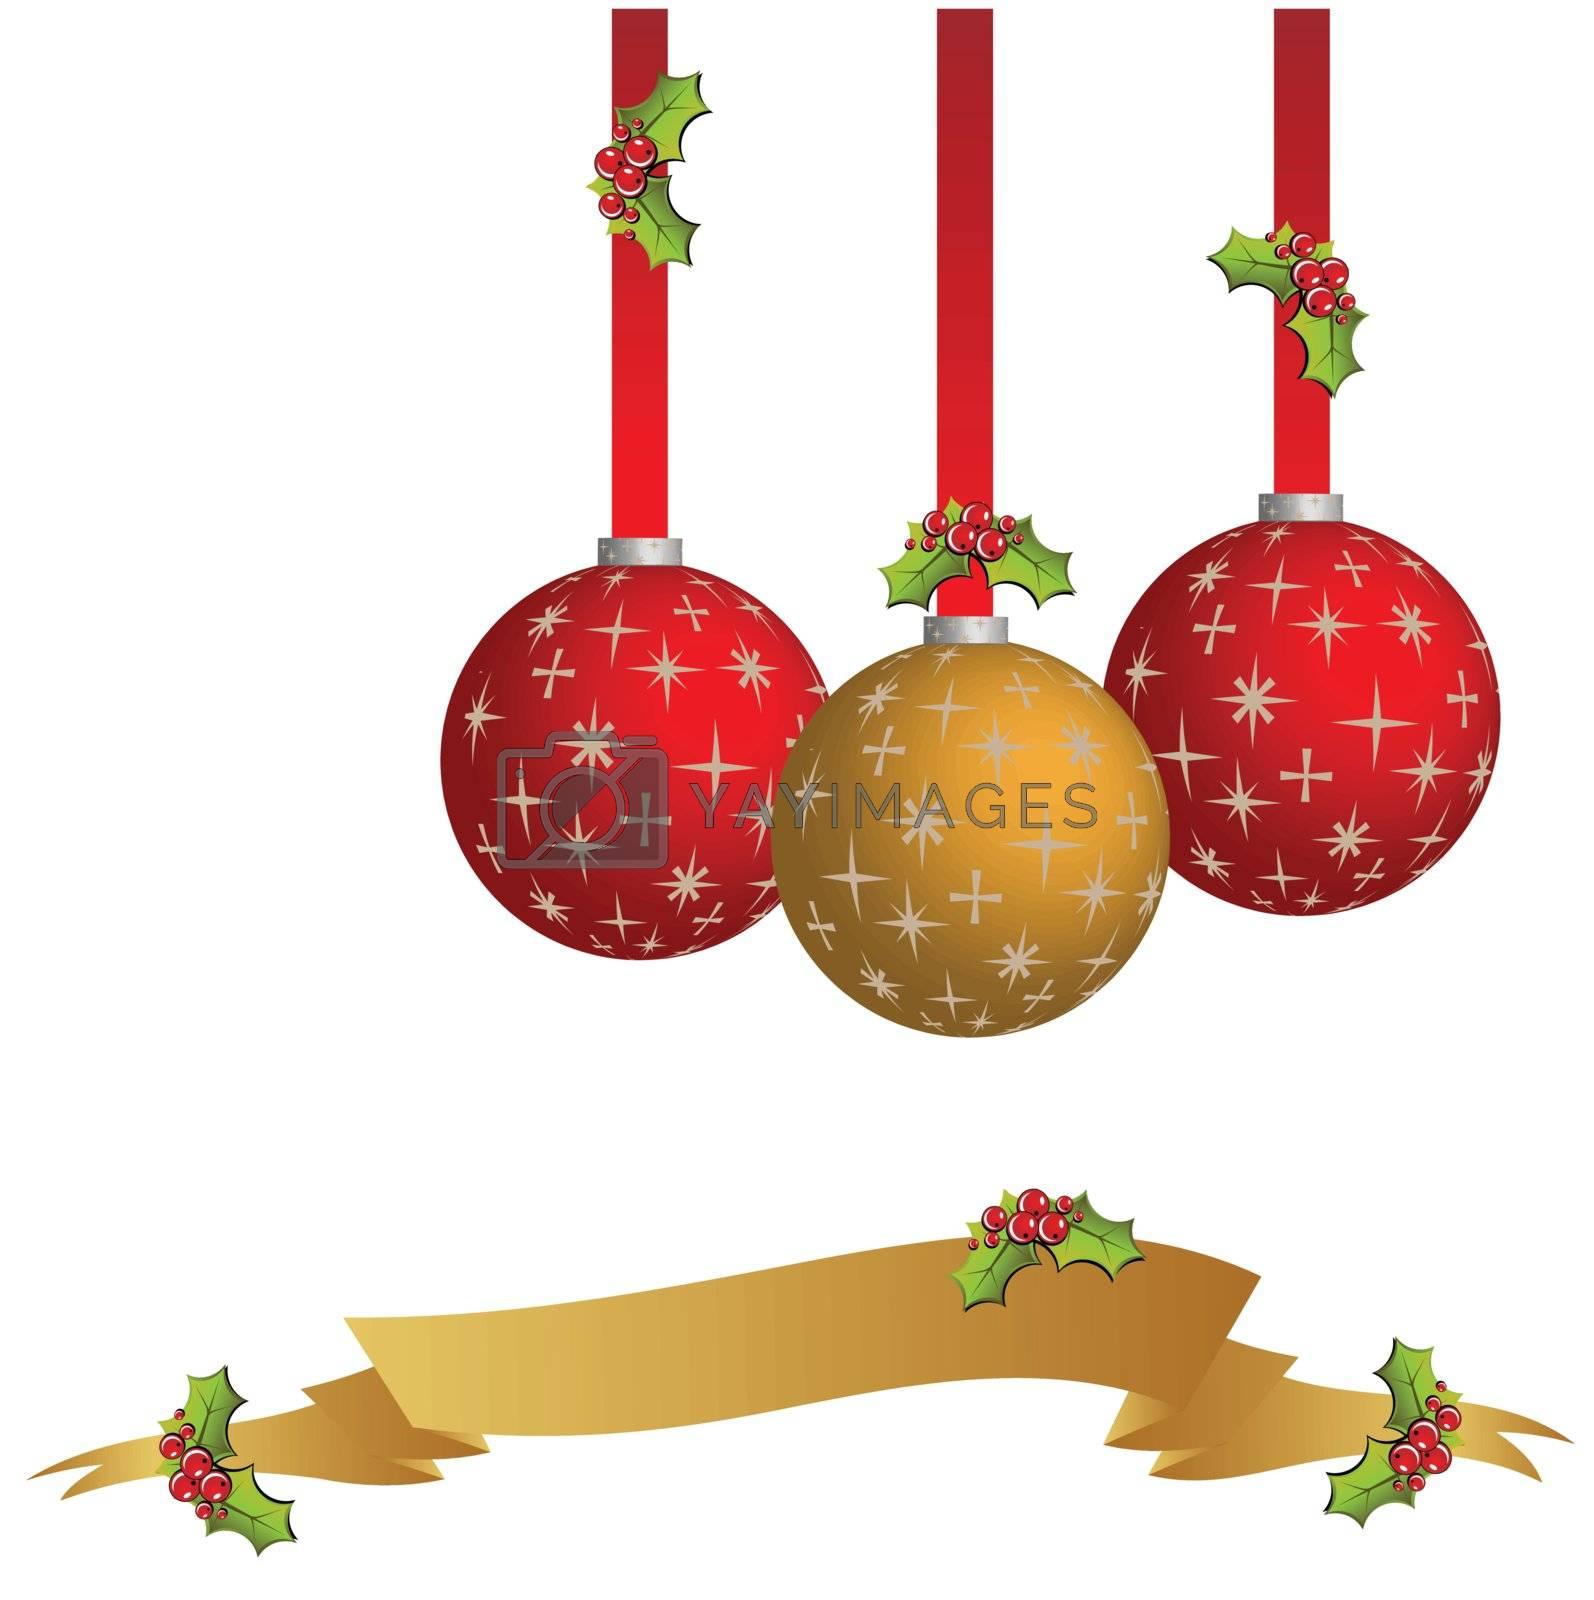 Christmas Ornaments by ajn